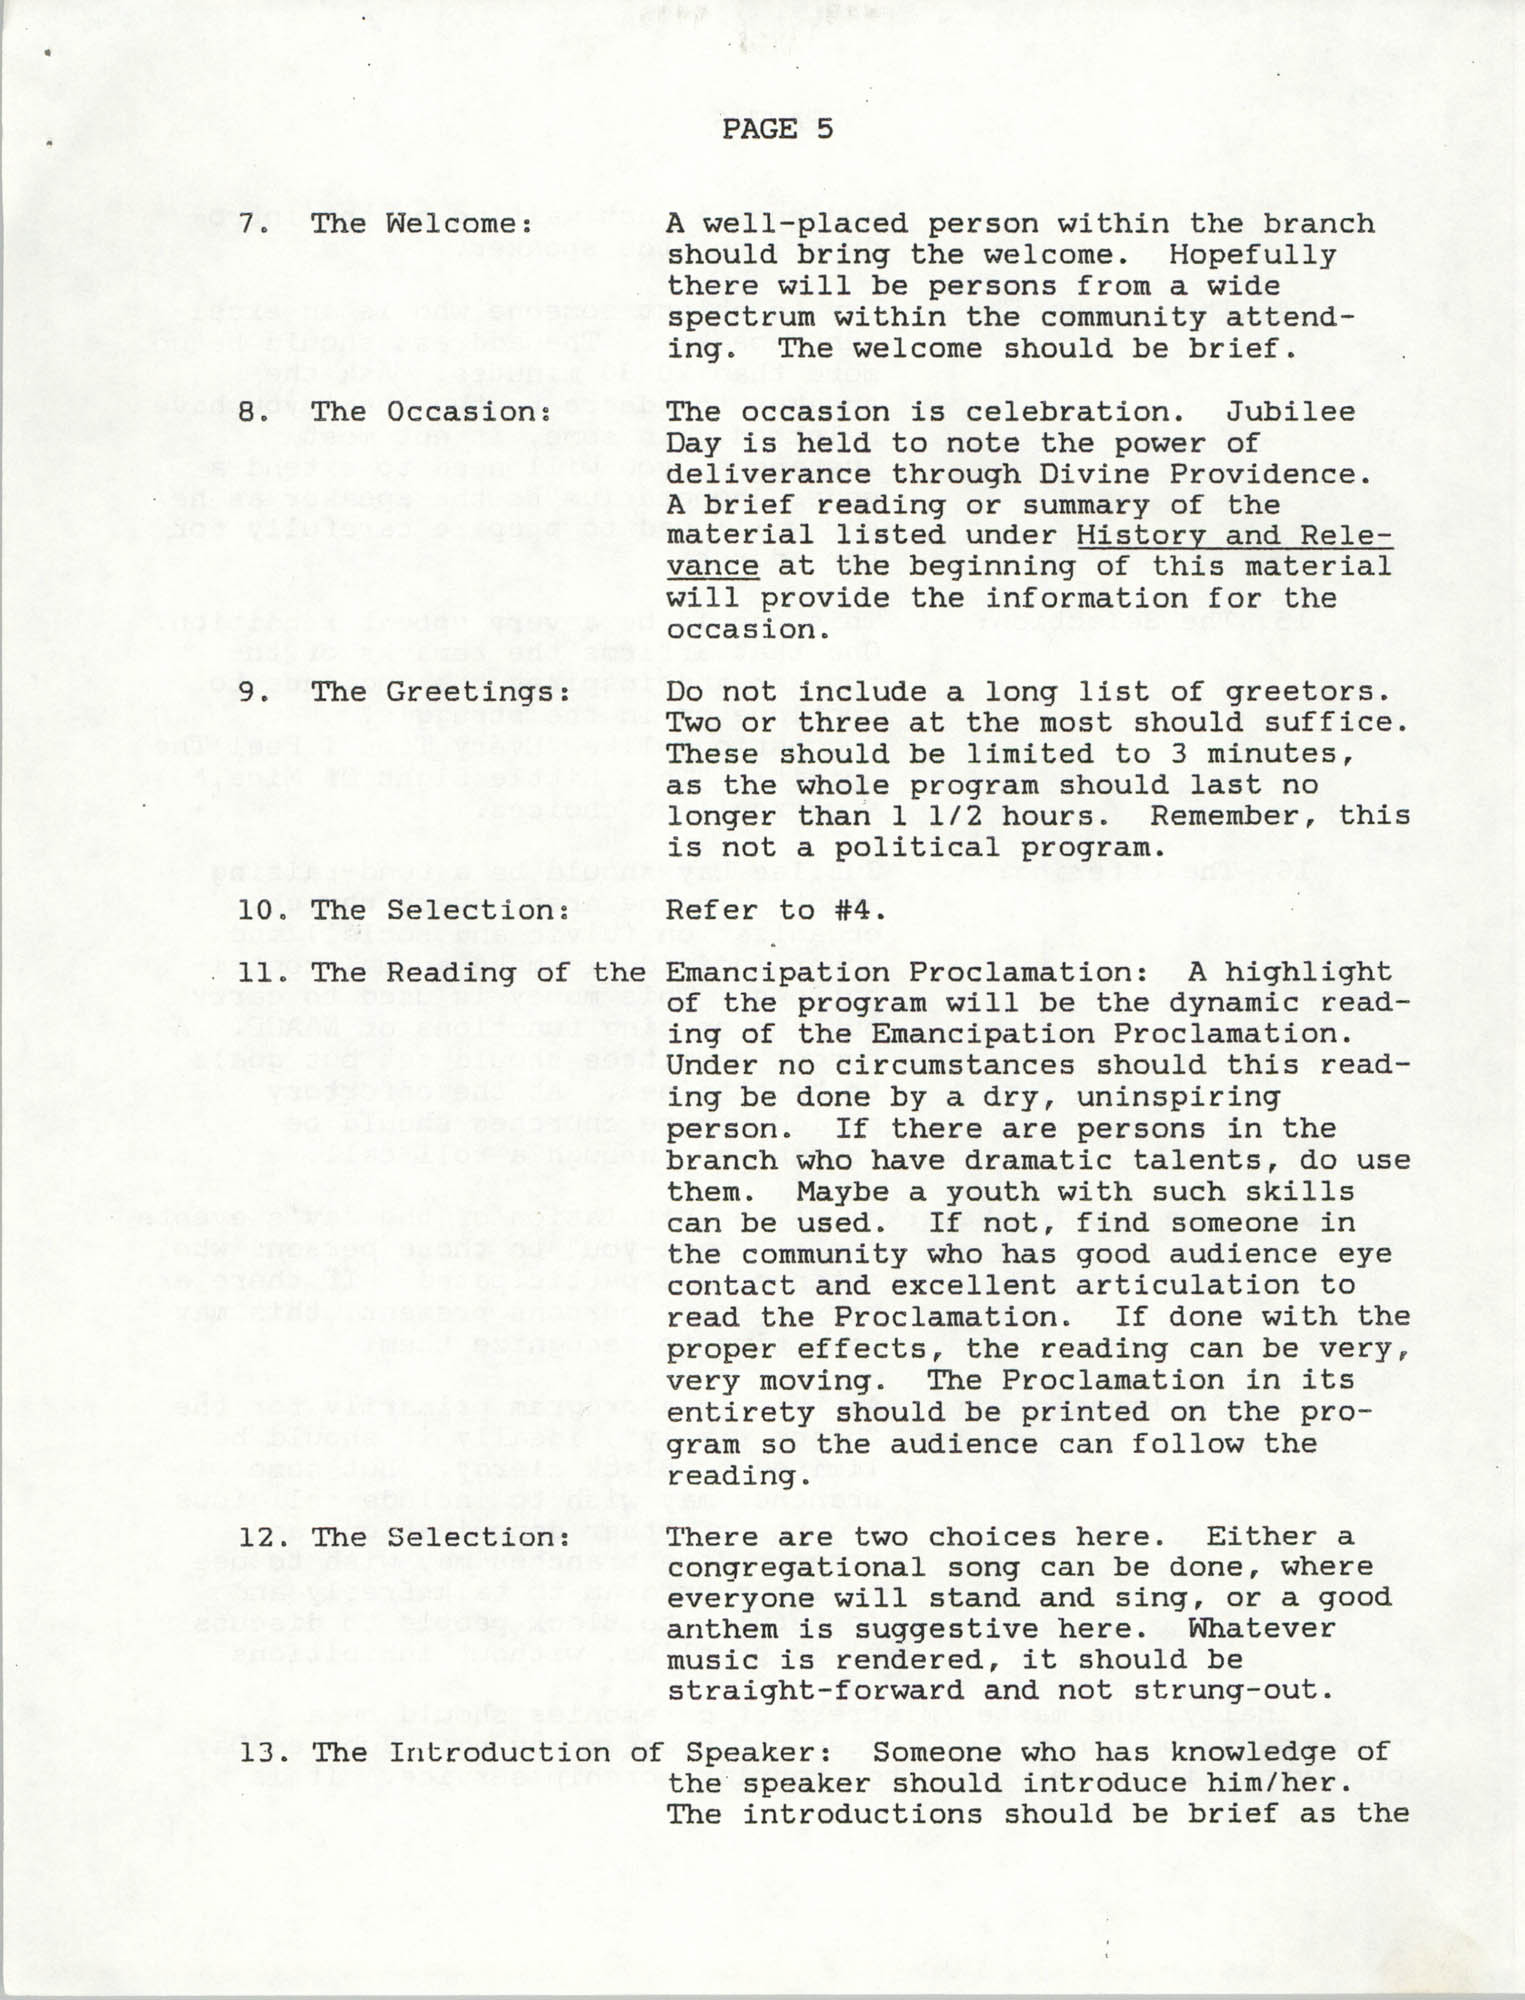 NAACP Memorandum, November 10, 1990, Page 5